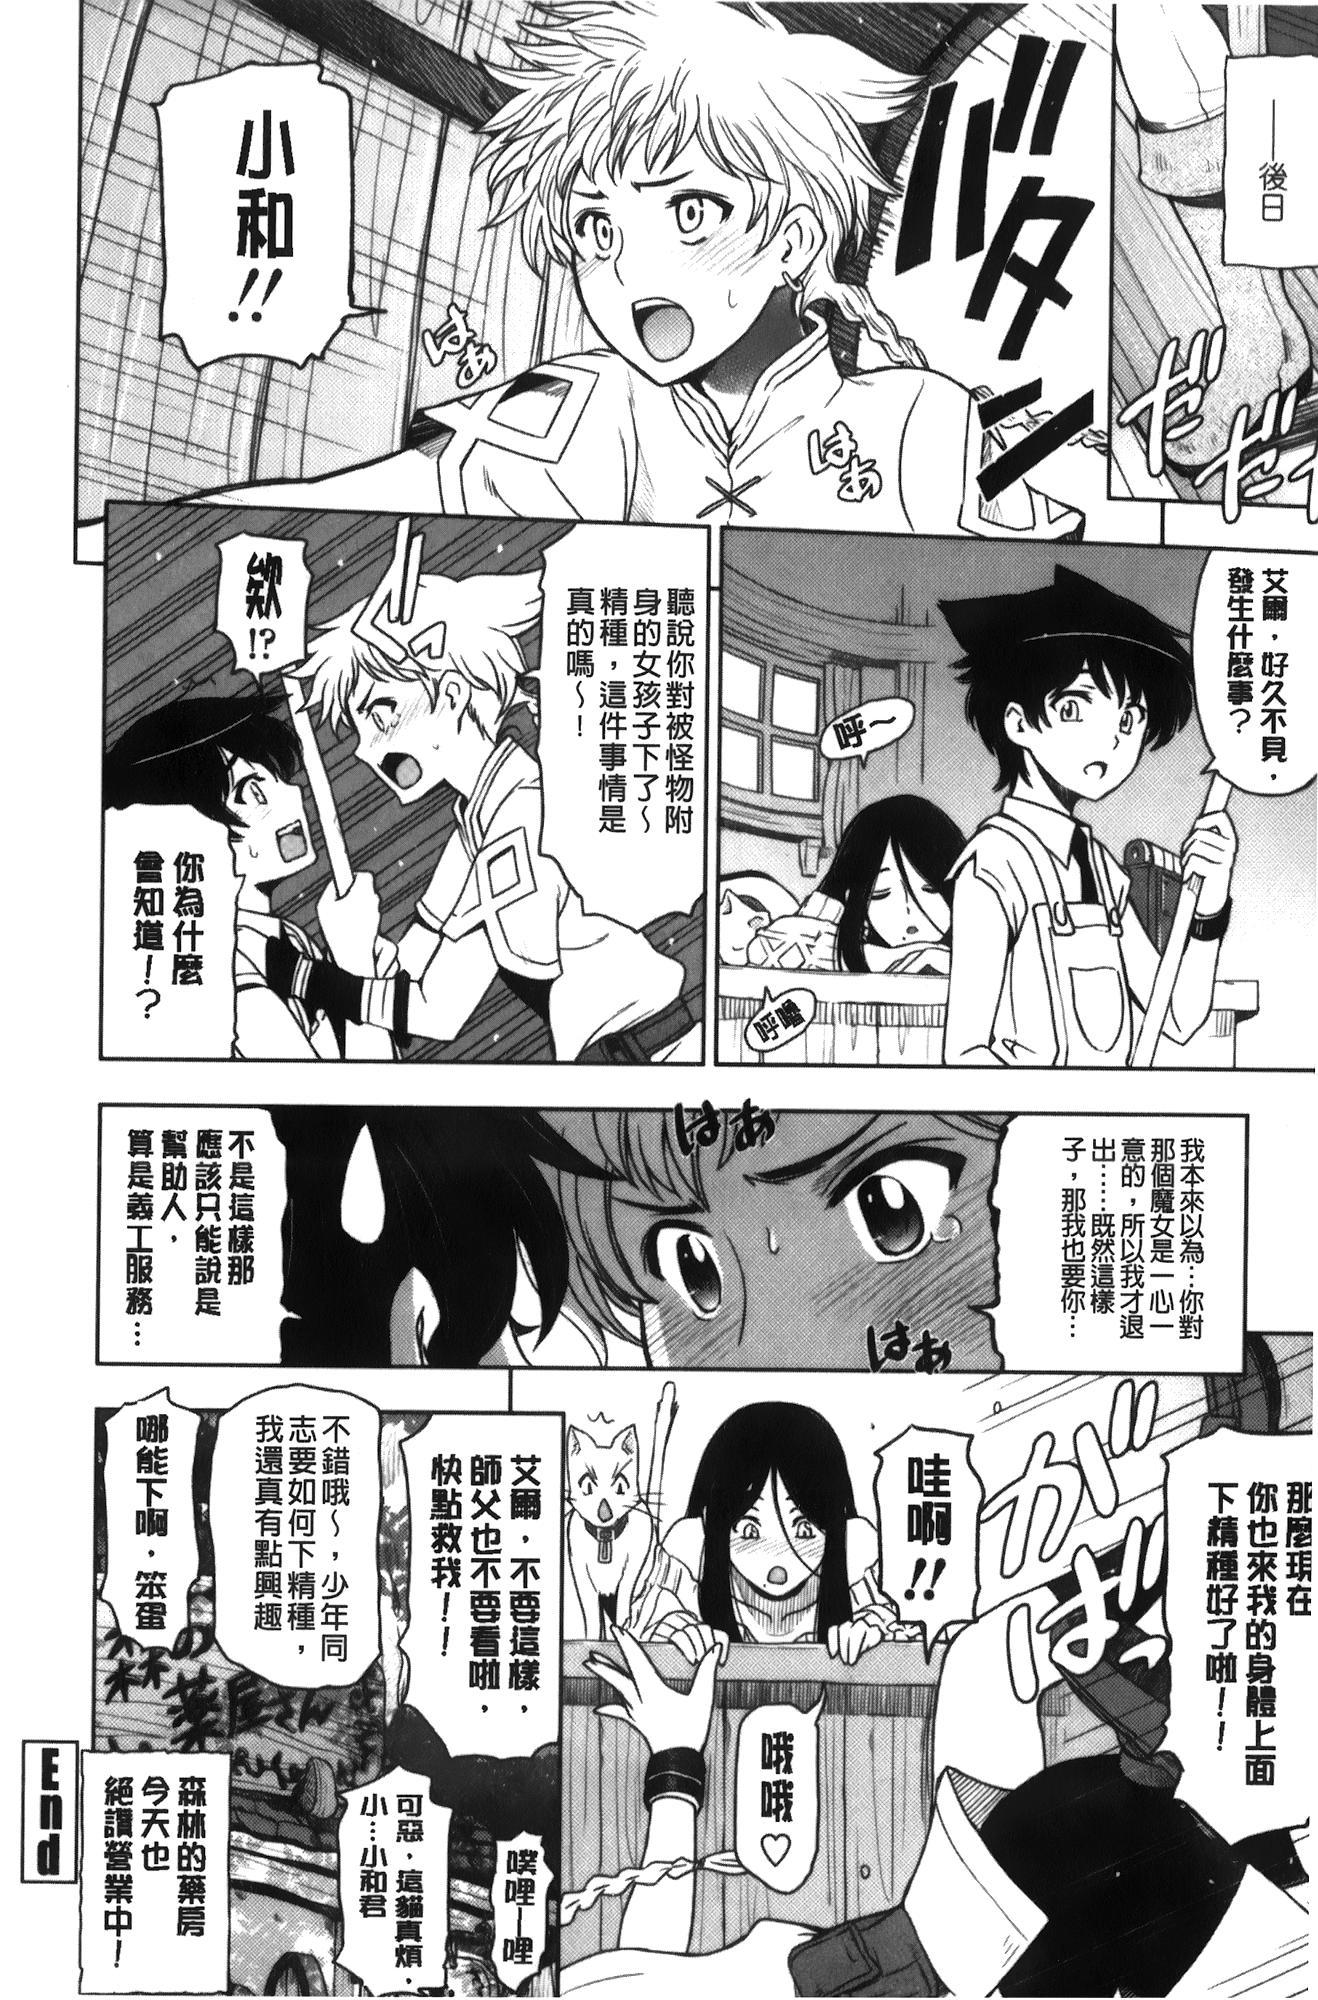 Majo × Shota ~ Genteiban | 魔女X小正太 限定版 214